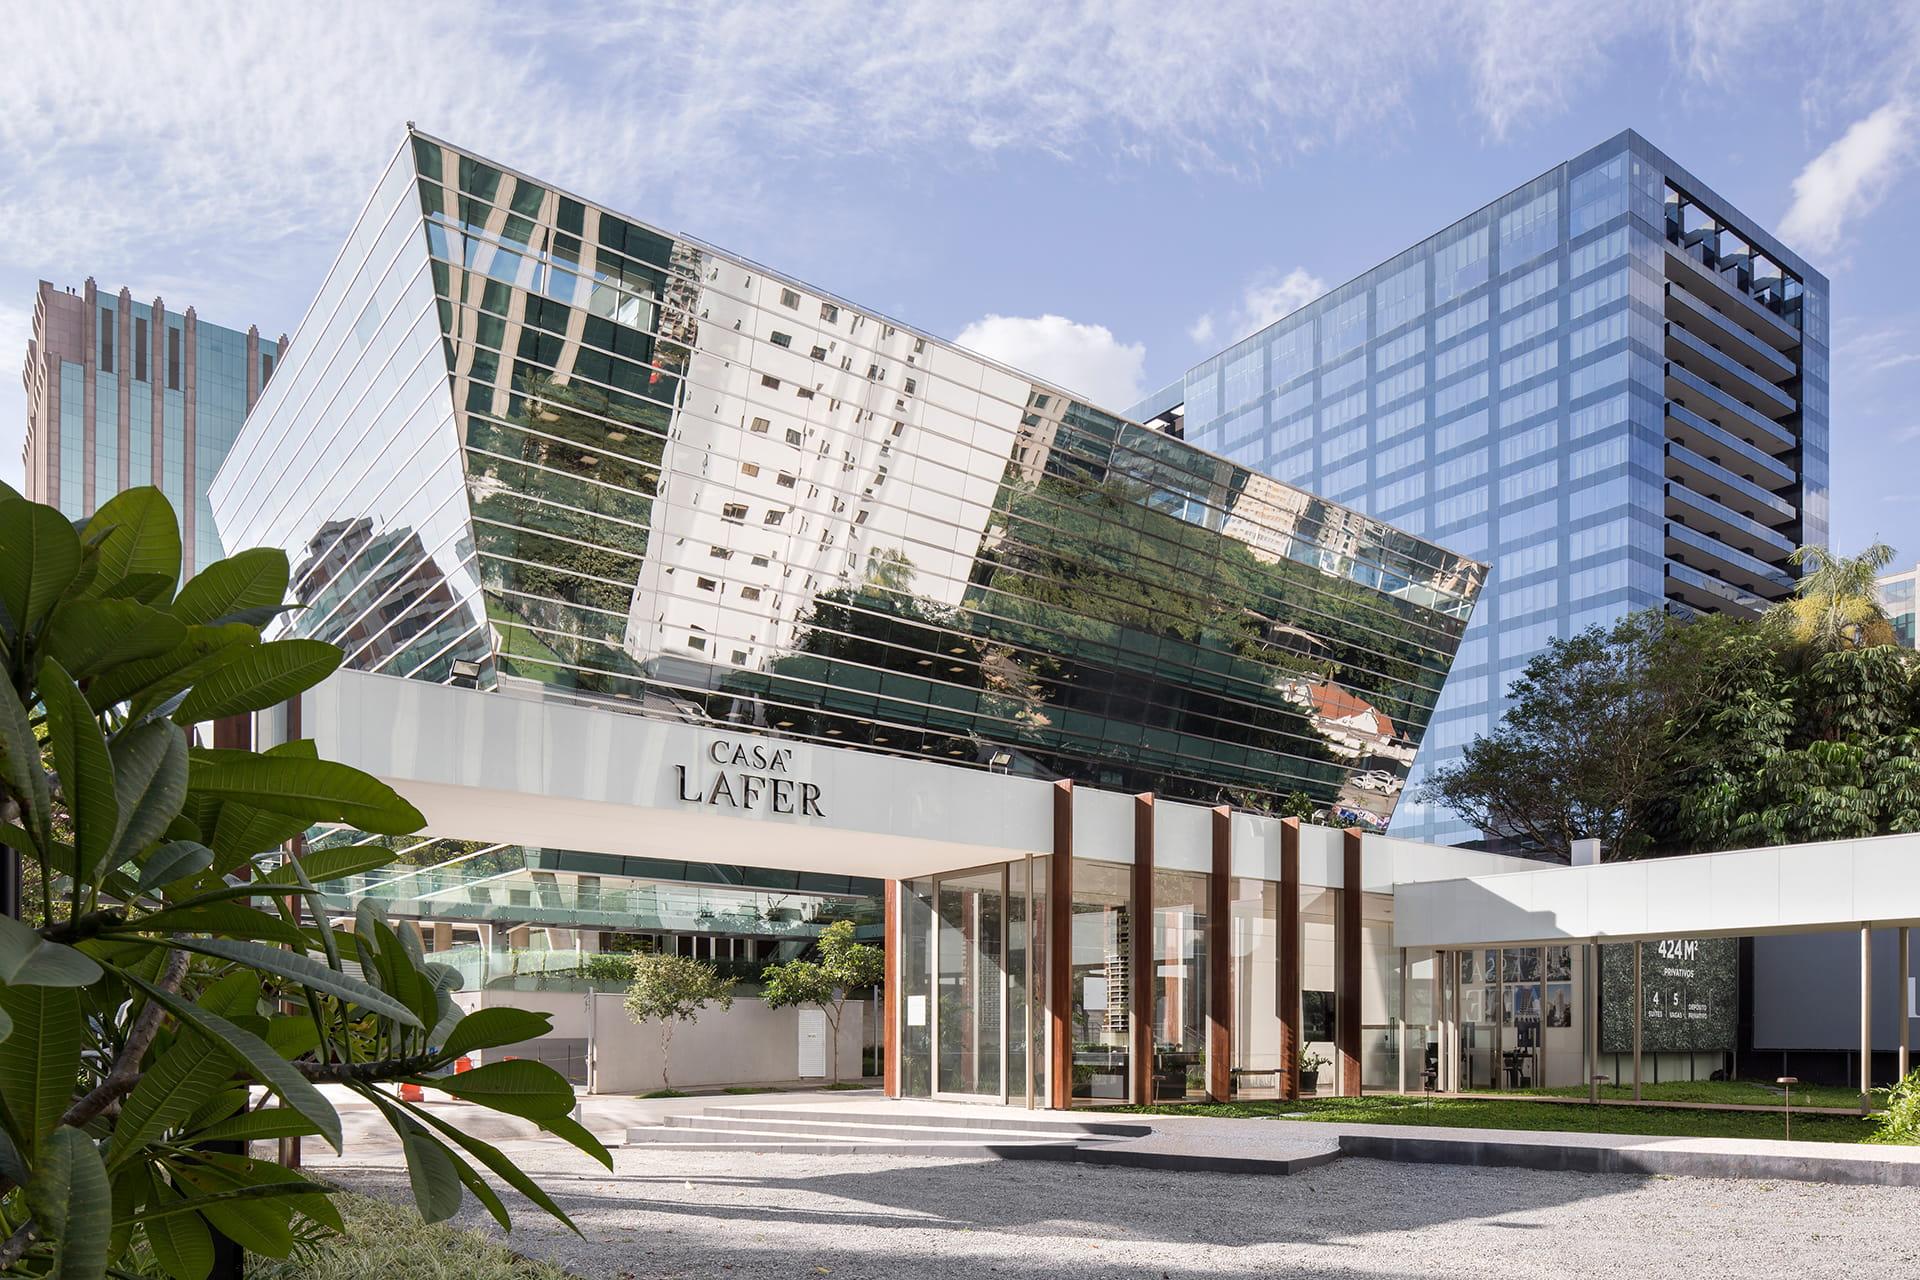 Stand Casa Lafer - Sabella Arquitetura